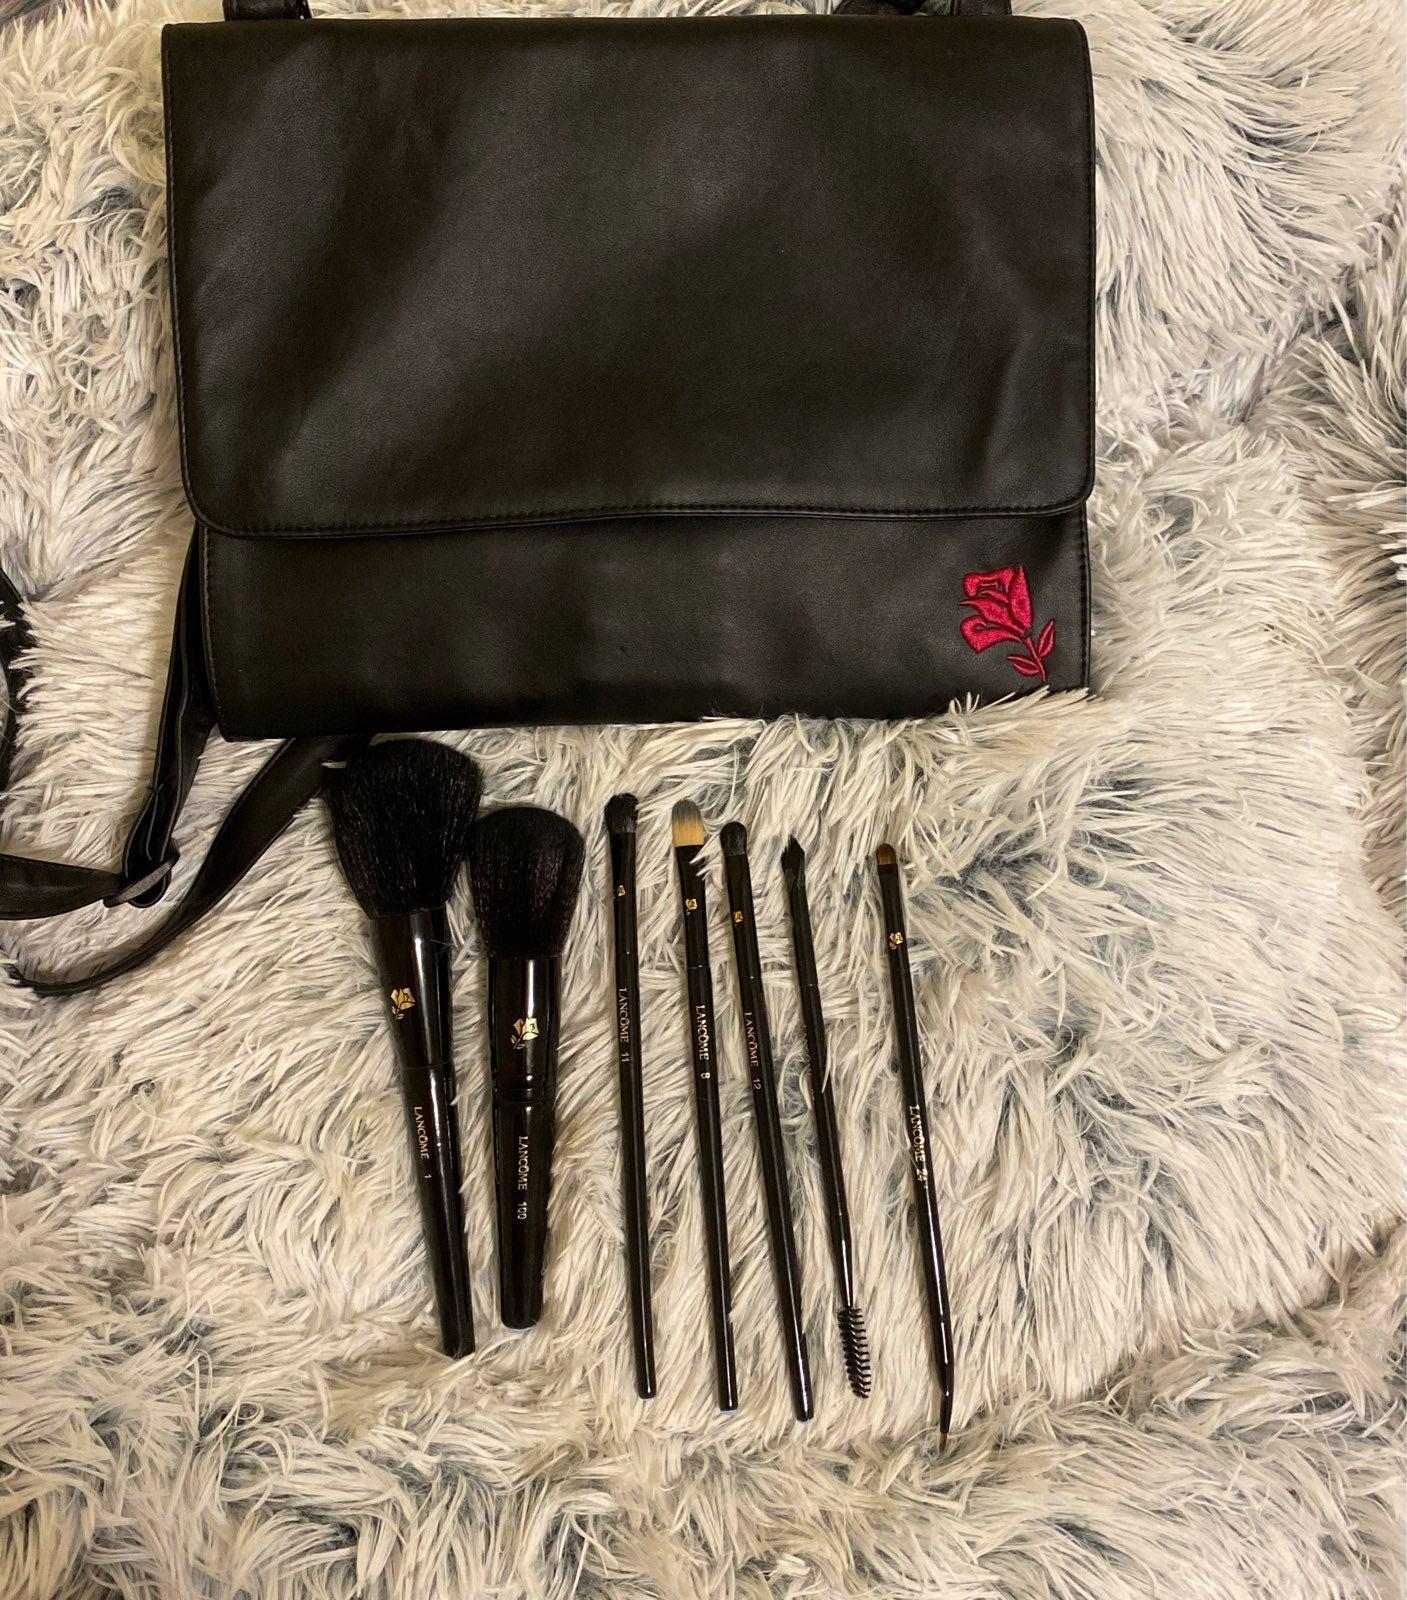 7 Lancôme Makeup Brushes and Belt